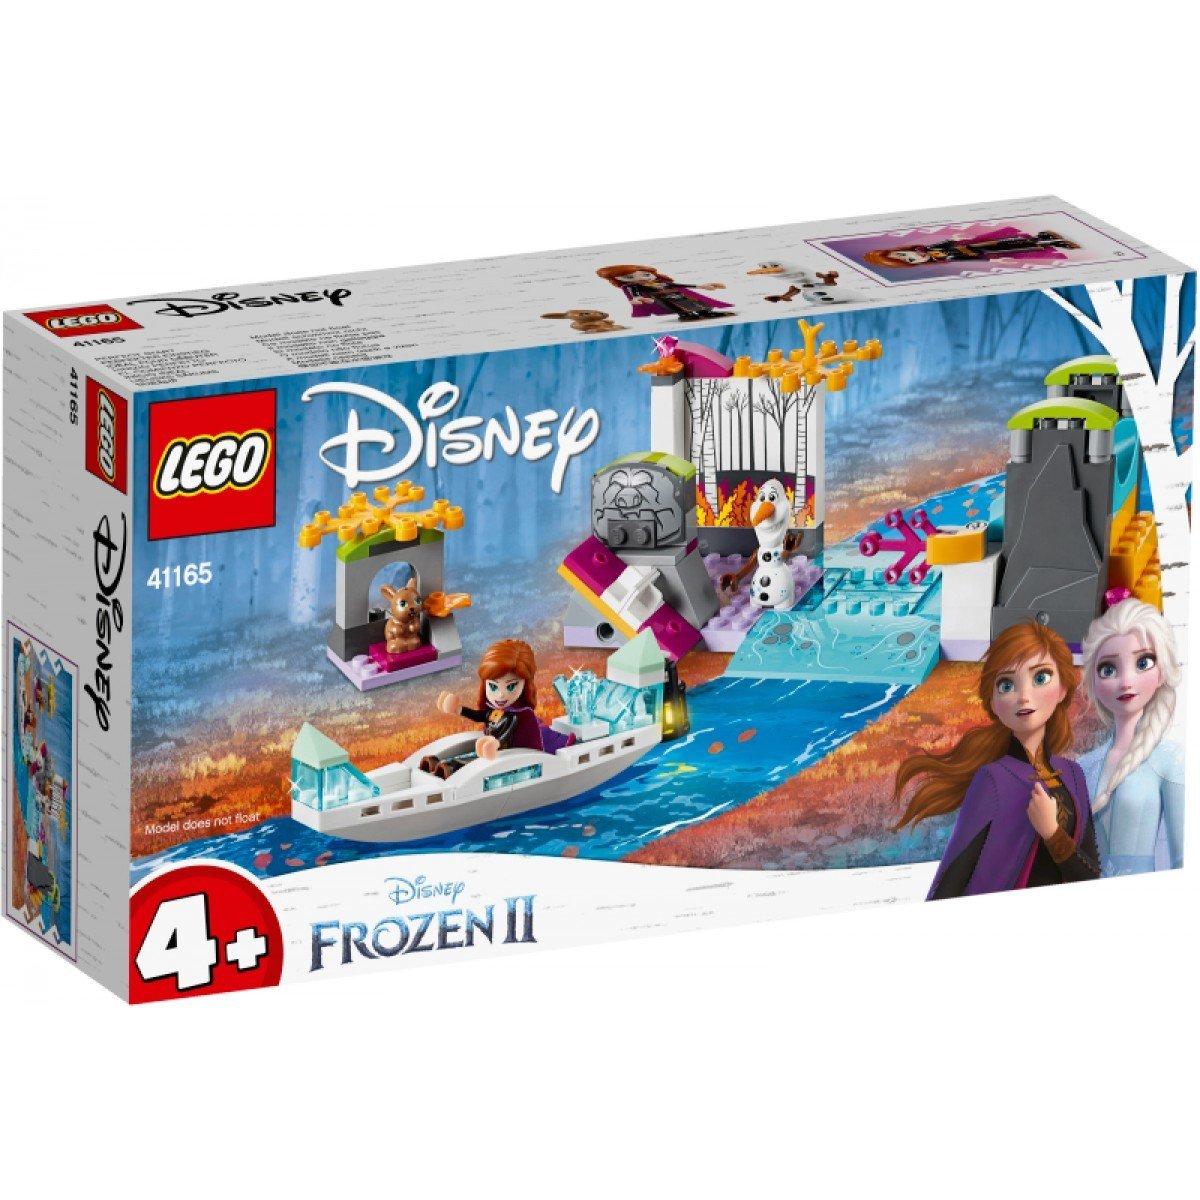 41165 LEGO® Disney Frozen Anos ekspedicija kanoja